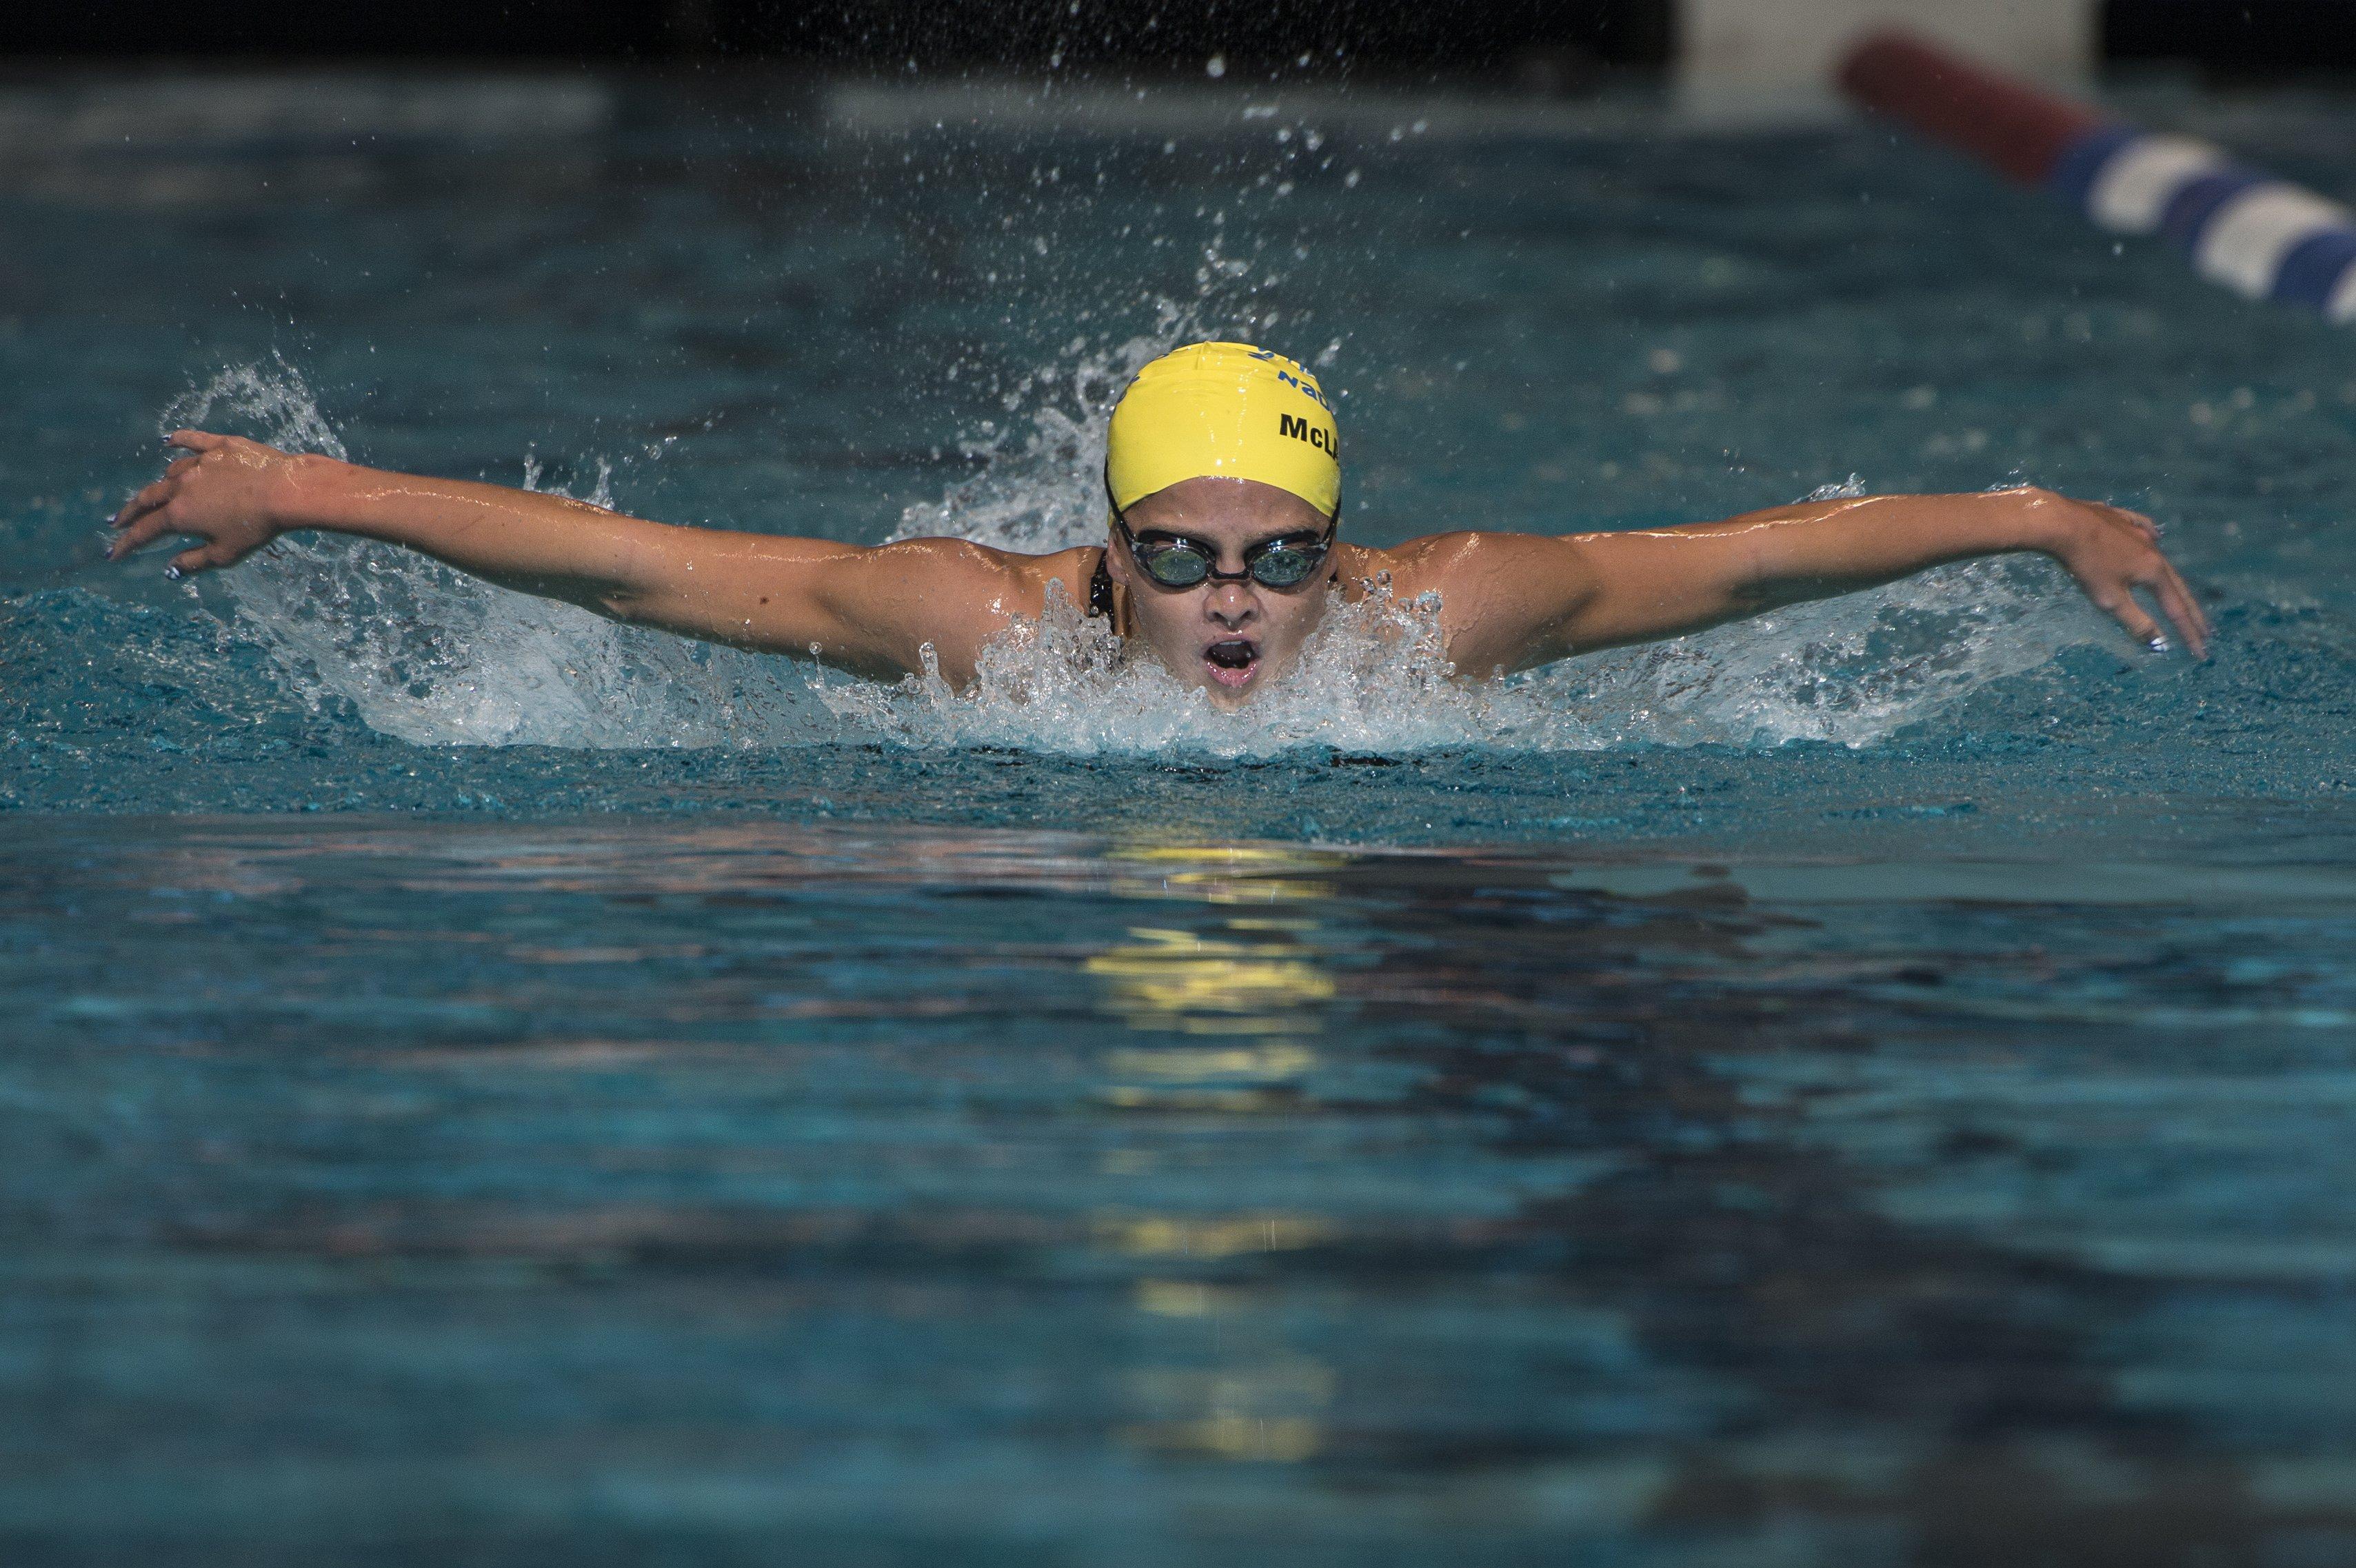 summer thunder swim meet 2012 honda